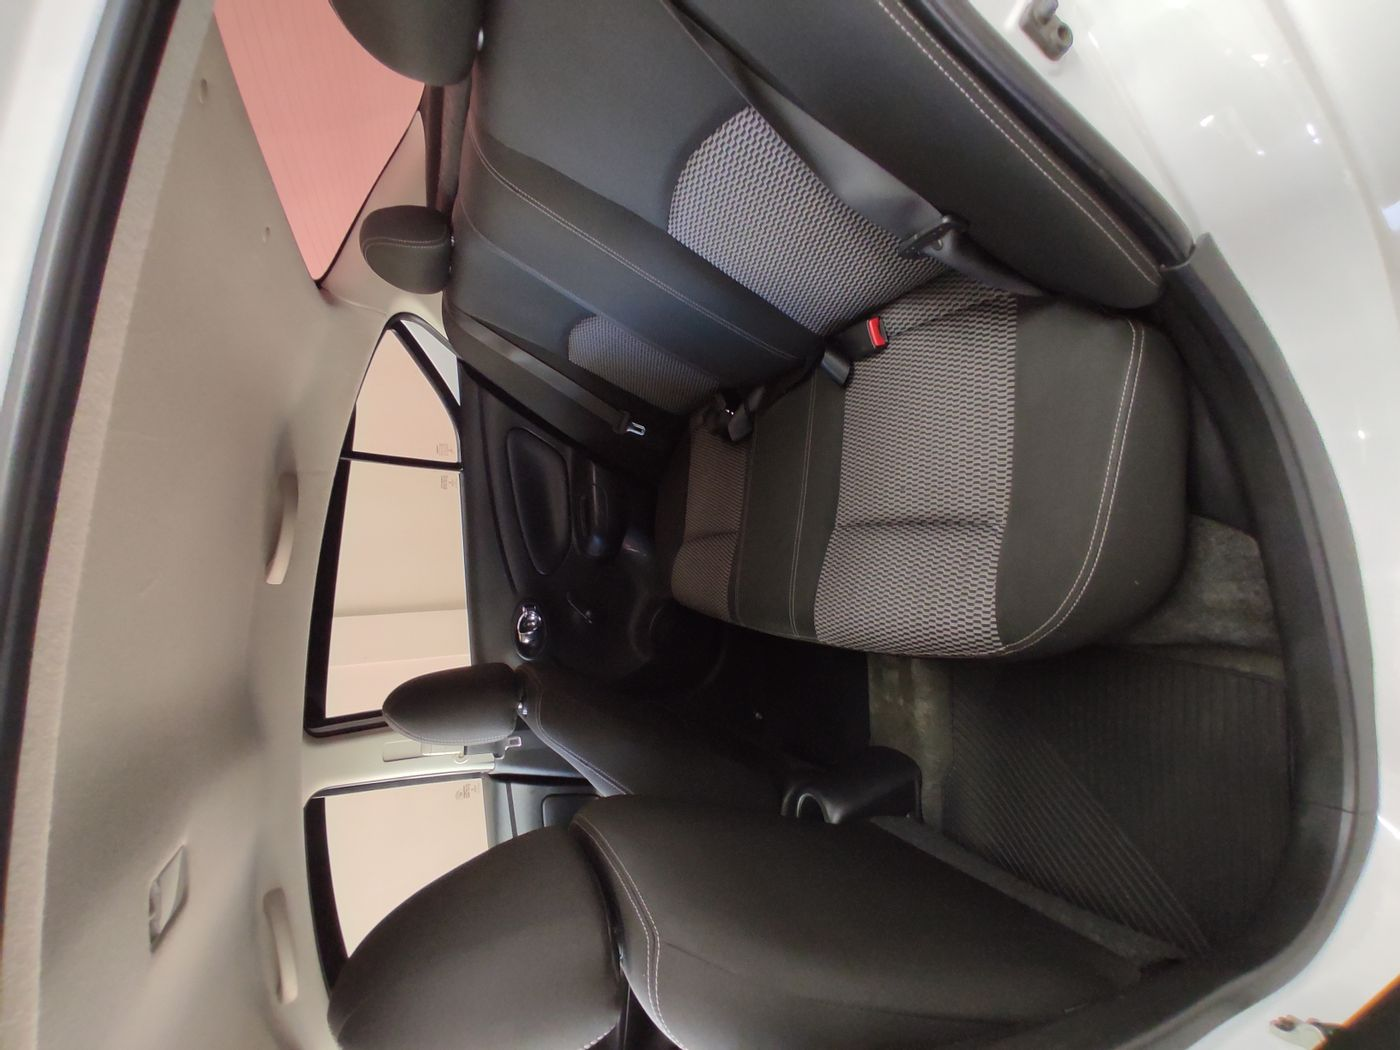 Nissan VERSA SV 1.6 16V FlexStart 4p Mec.